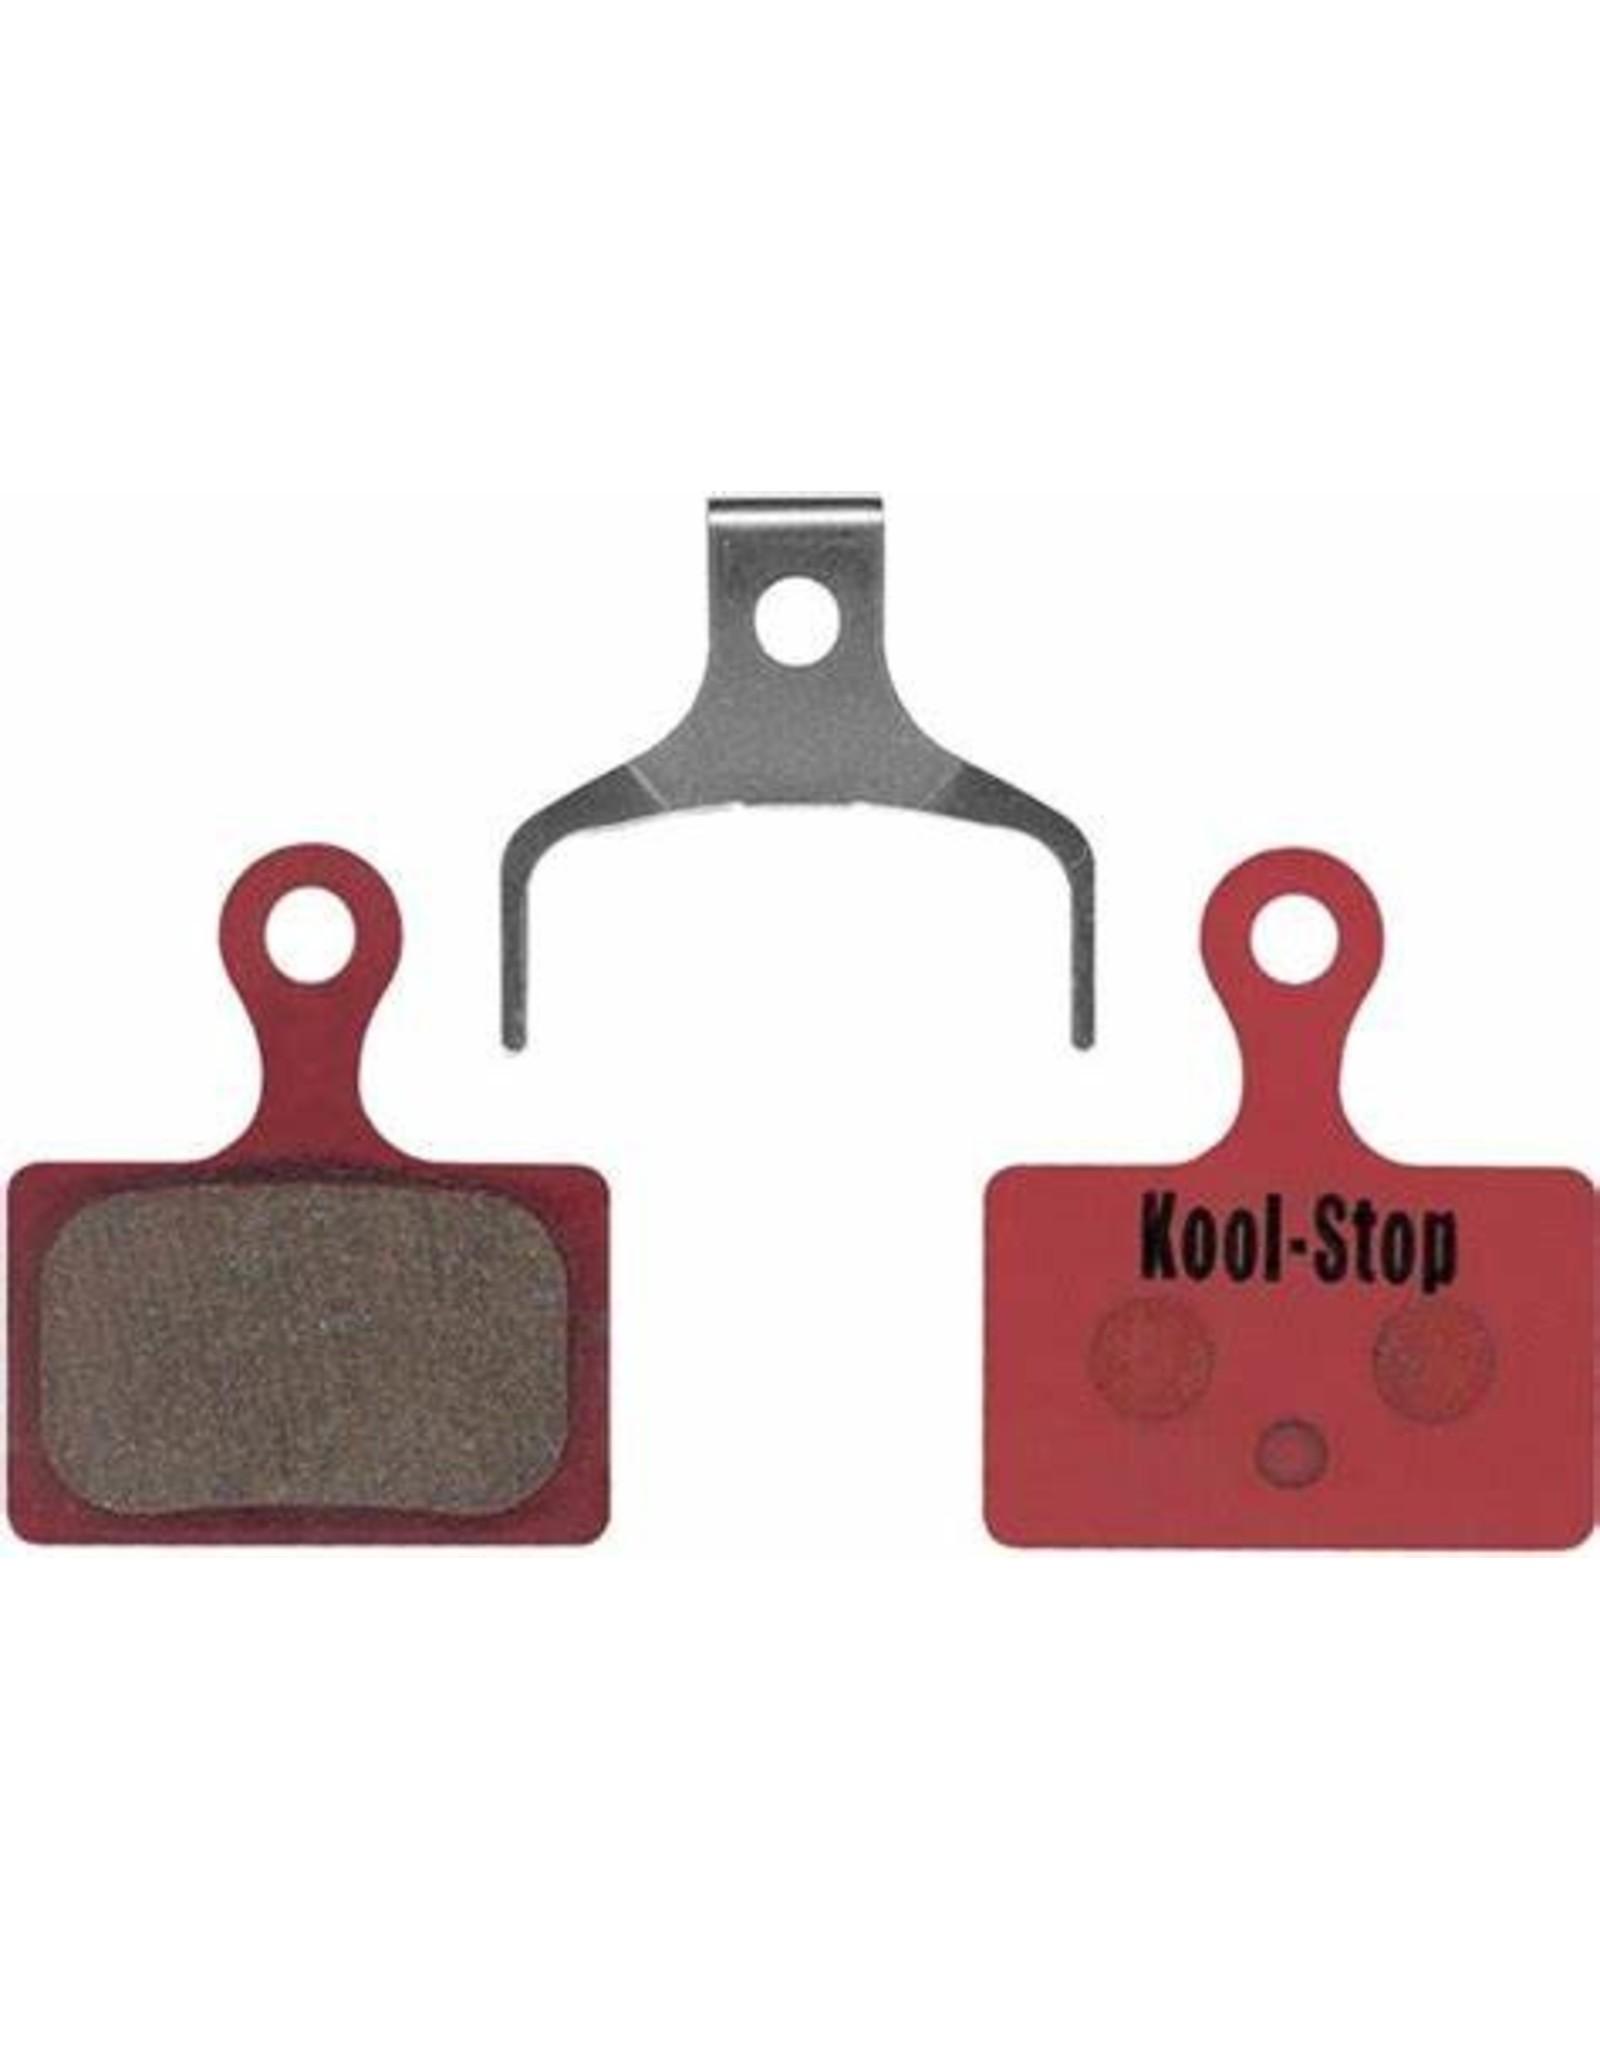 Kool Stop Kool-Stop Shimano Organic Direct Mount RS505/RS805 Road Disc Brake Pads Steel Plate #KS-D625